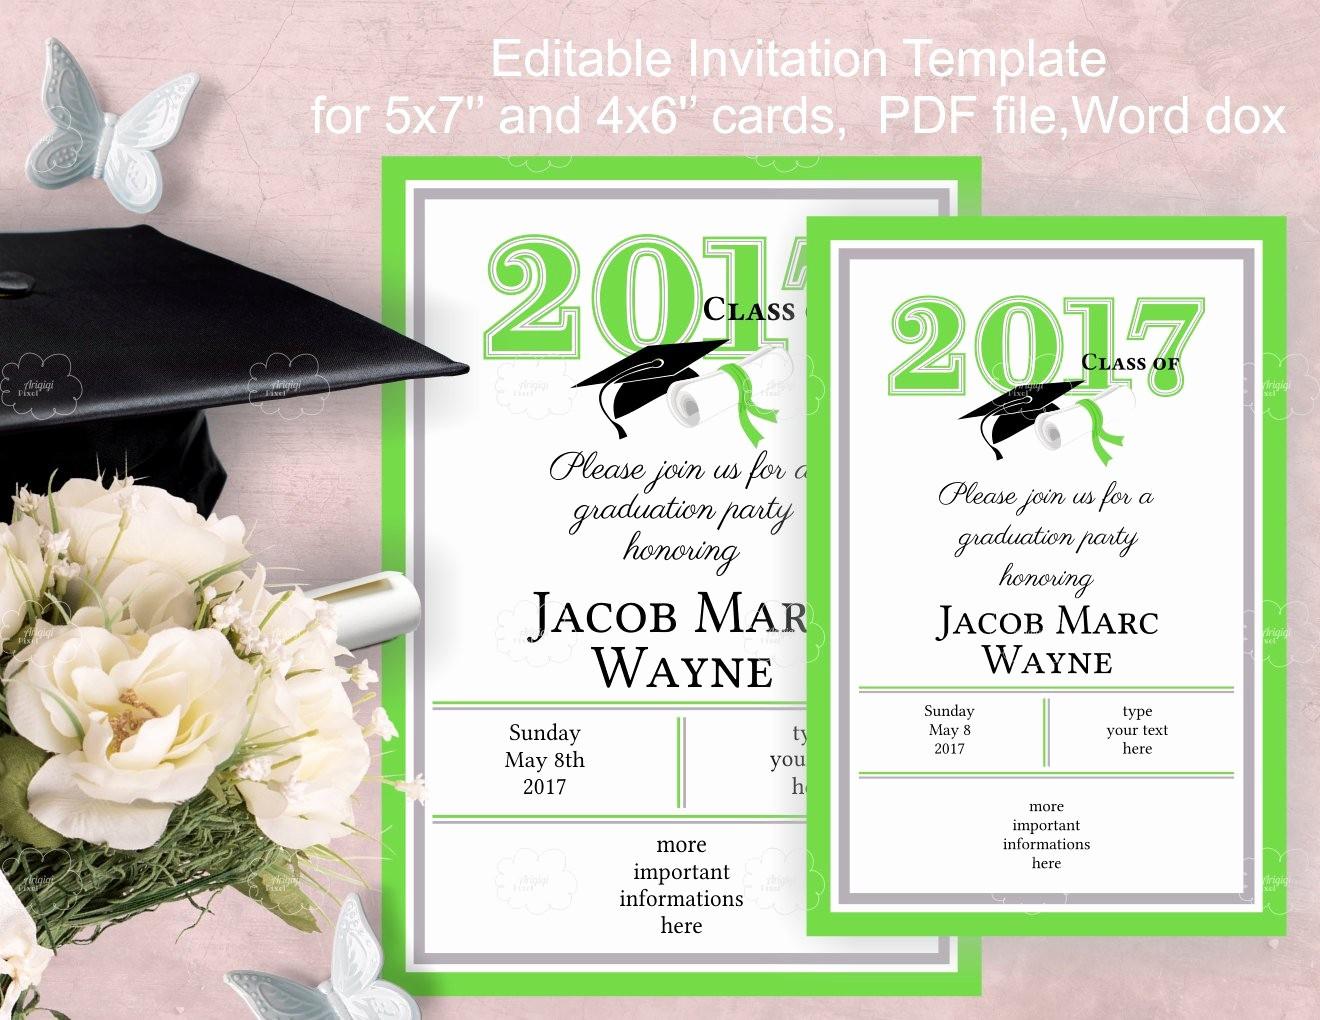 Graduation Party Invitation Template Word Beautiful Graduation Party Invitation Template Edit Yourself